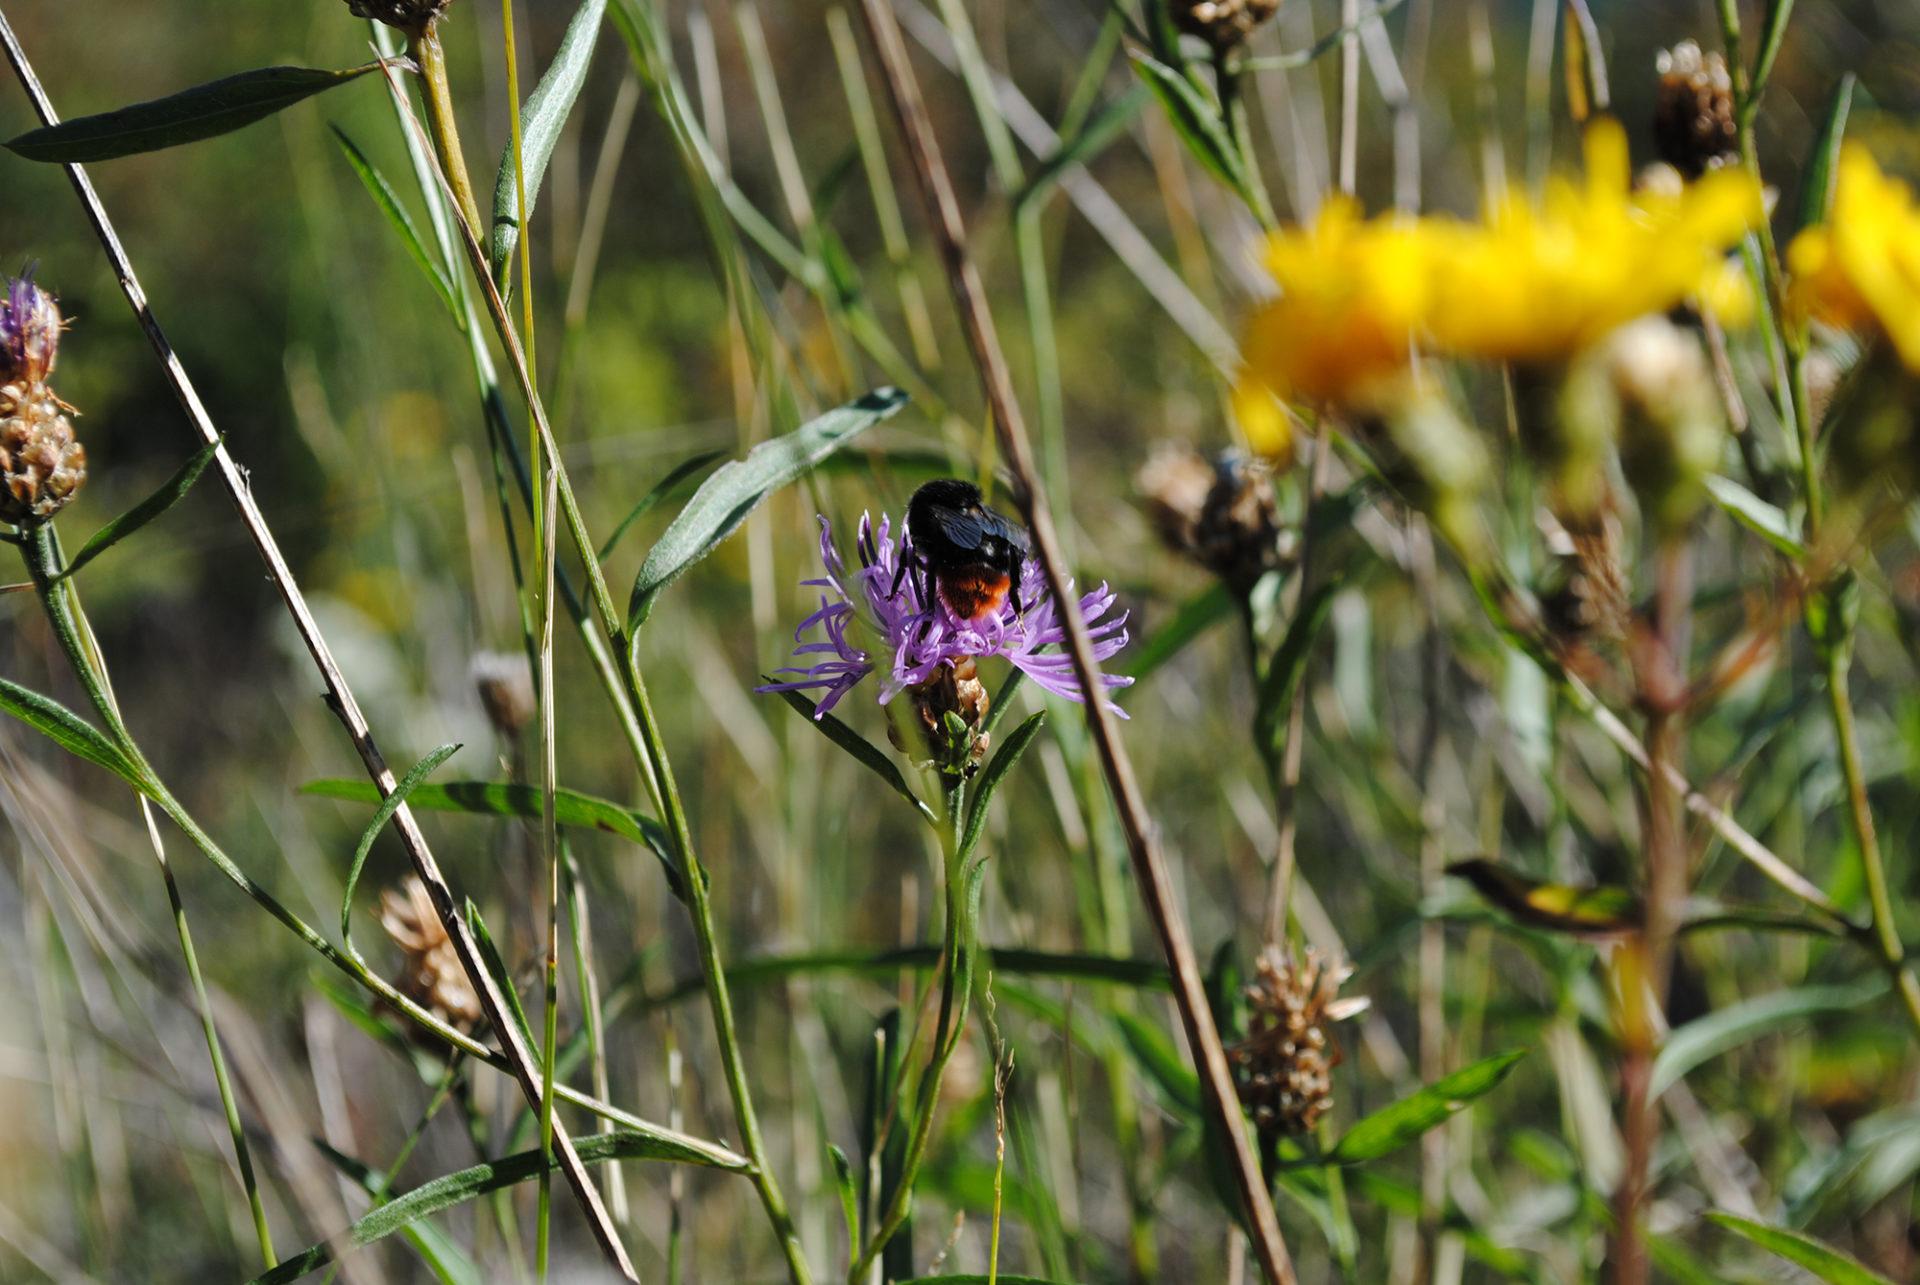 Bienen im Garten fördern